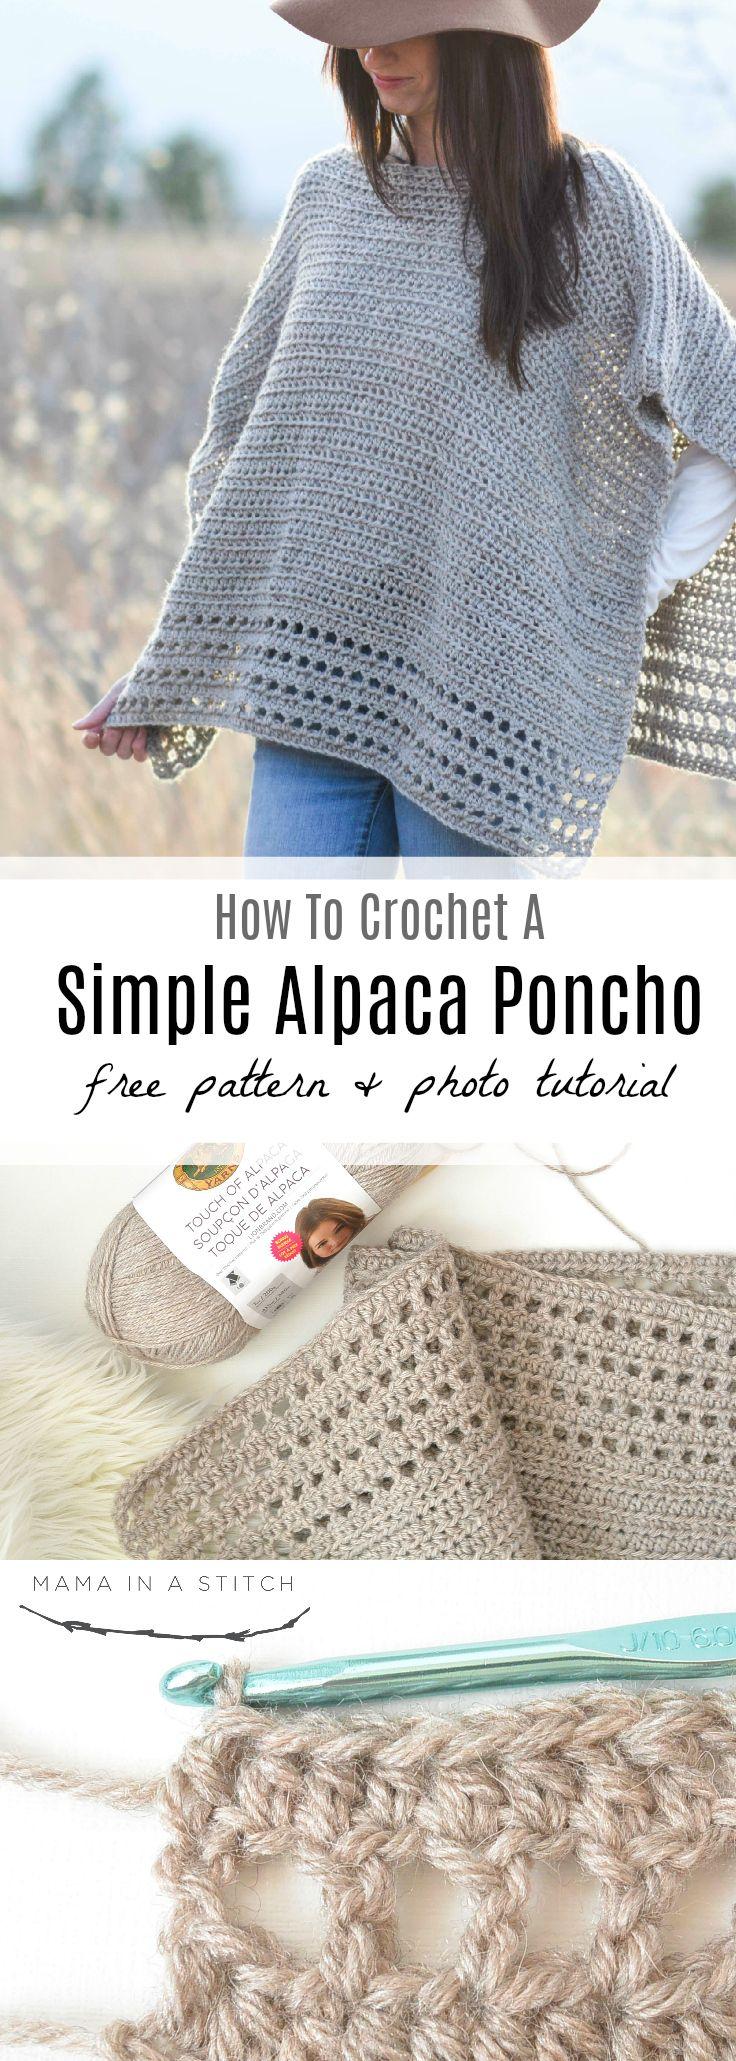 Light Alpaca Poncho Crochet Pattern via @MamaInAStitch Easy crochet ...